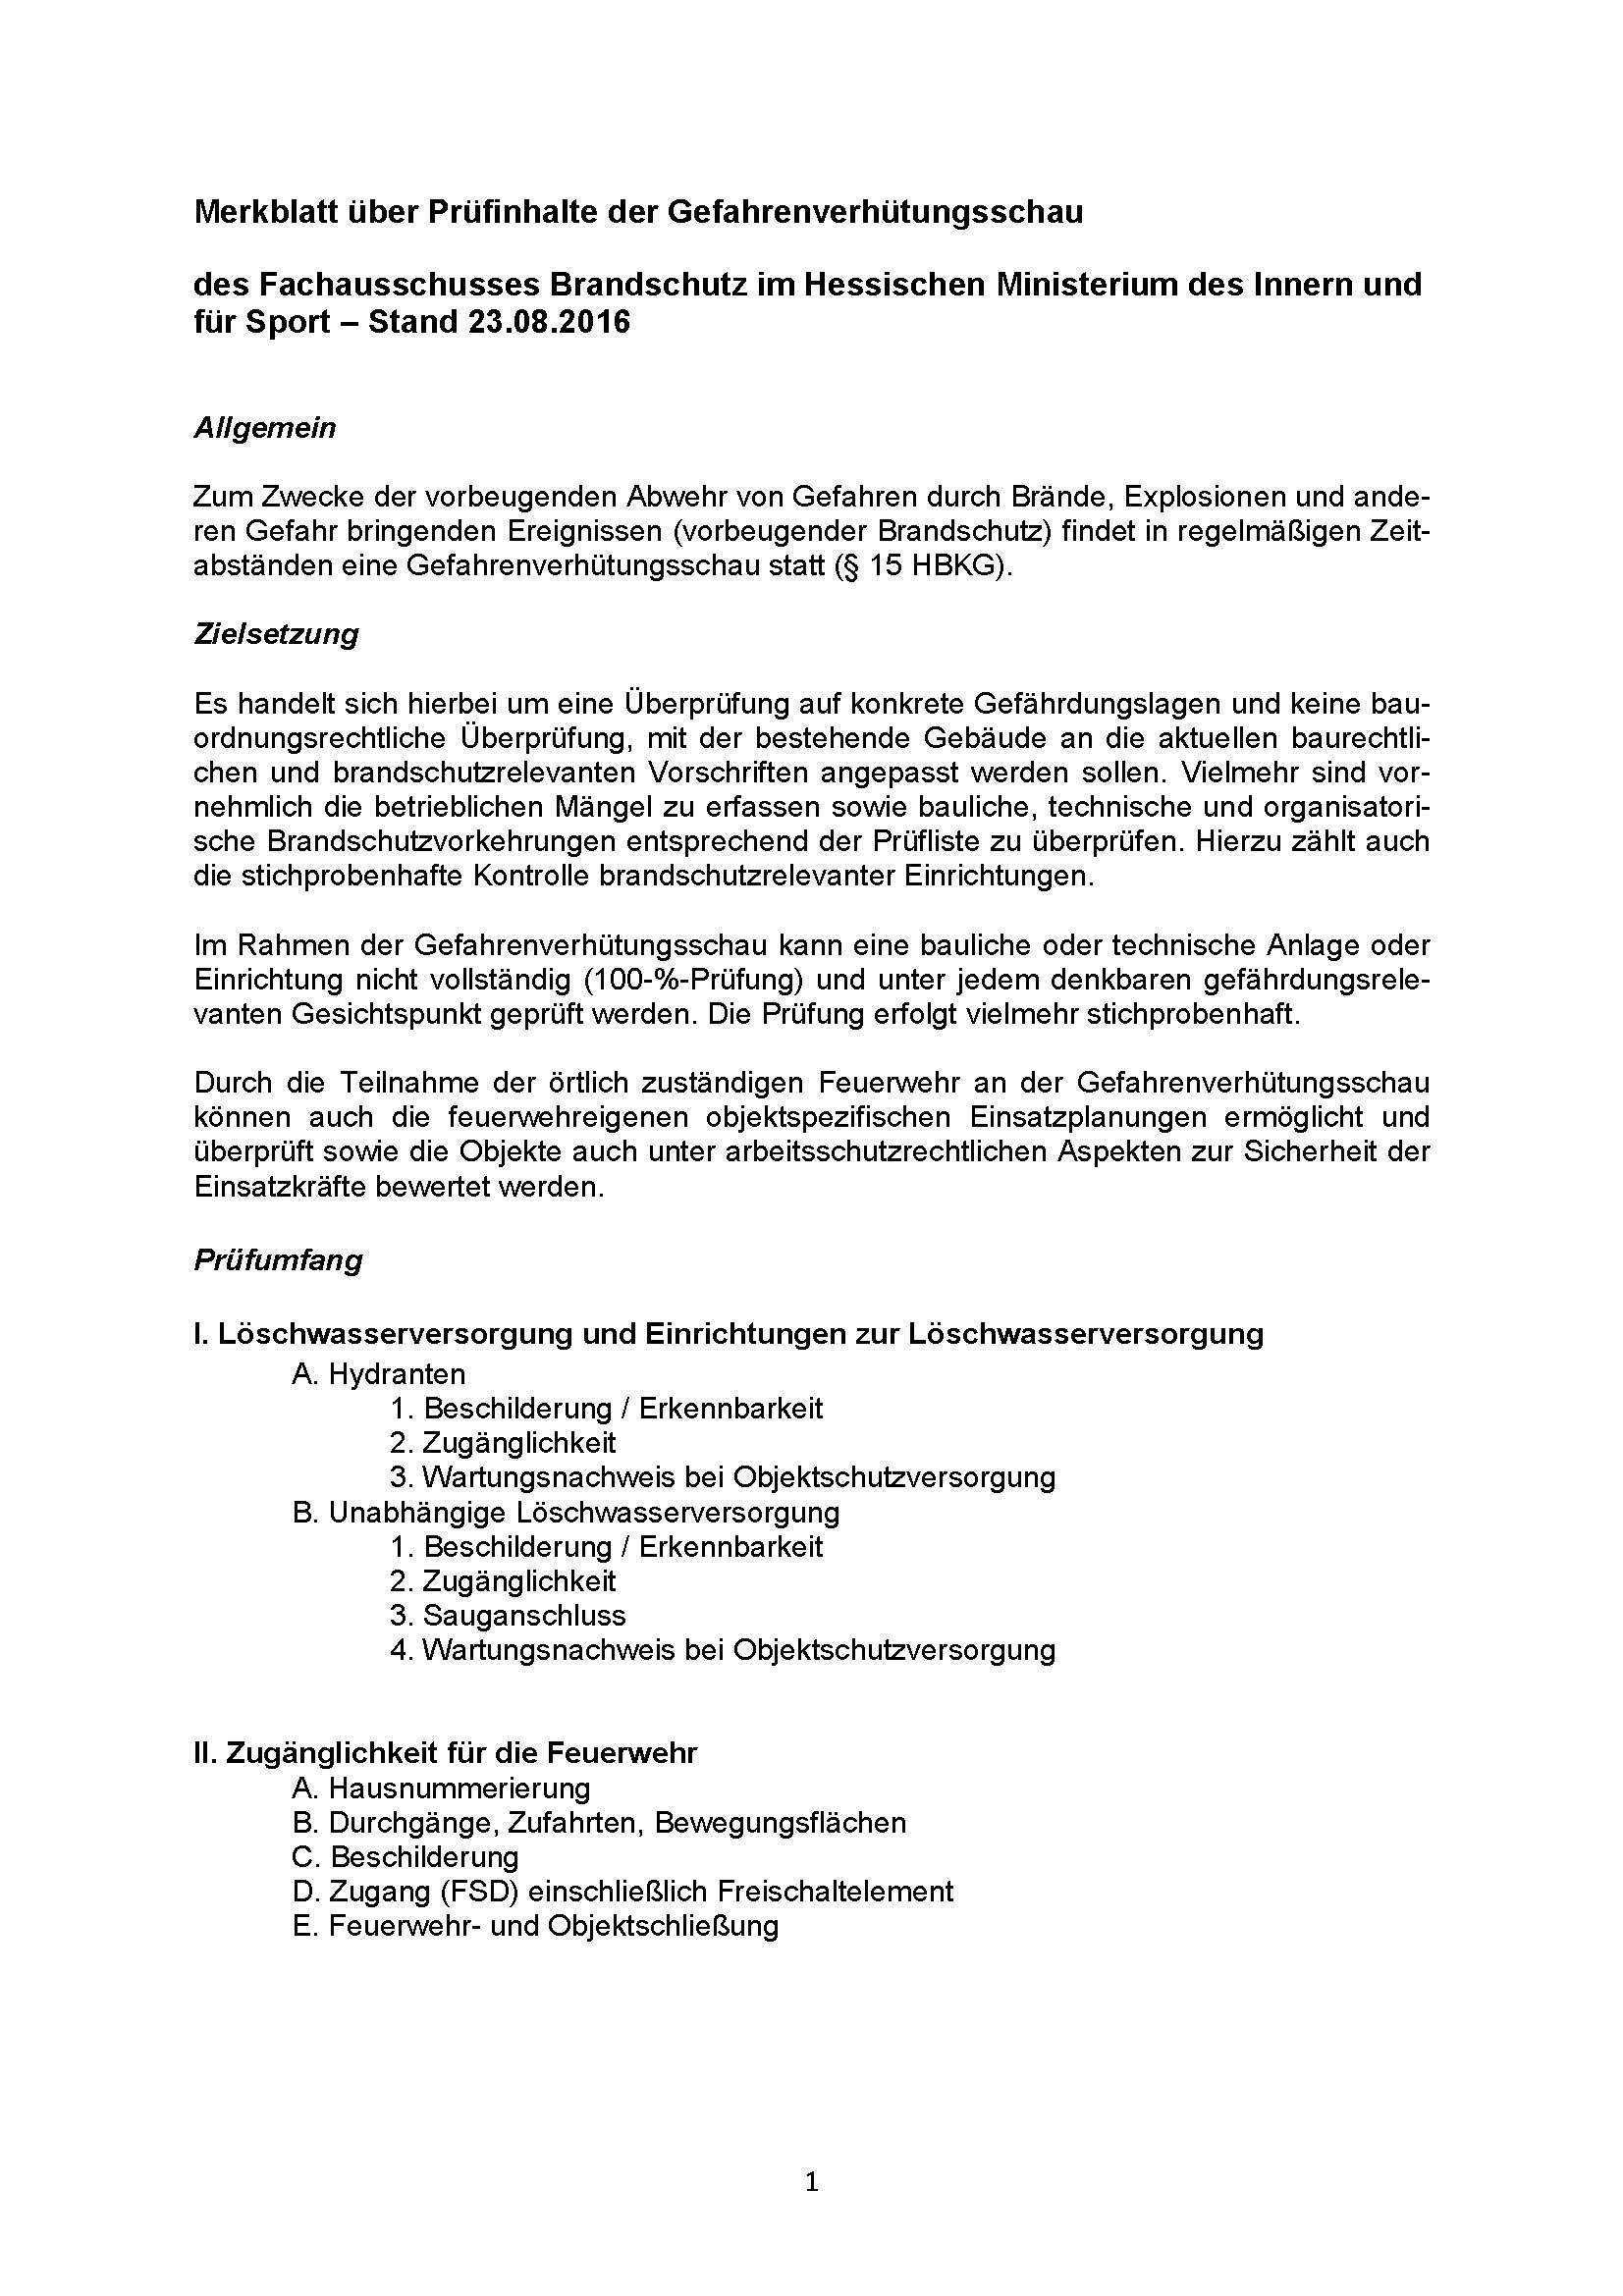 Vorbeugender Brandschutz Landesfeuerwehrverband Hessen